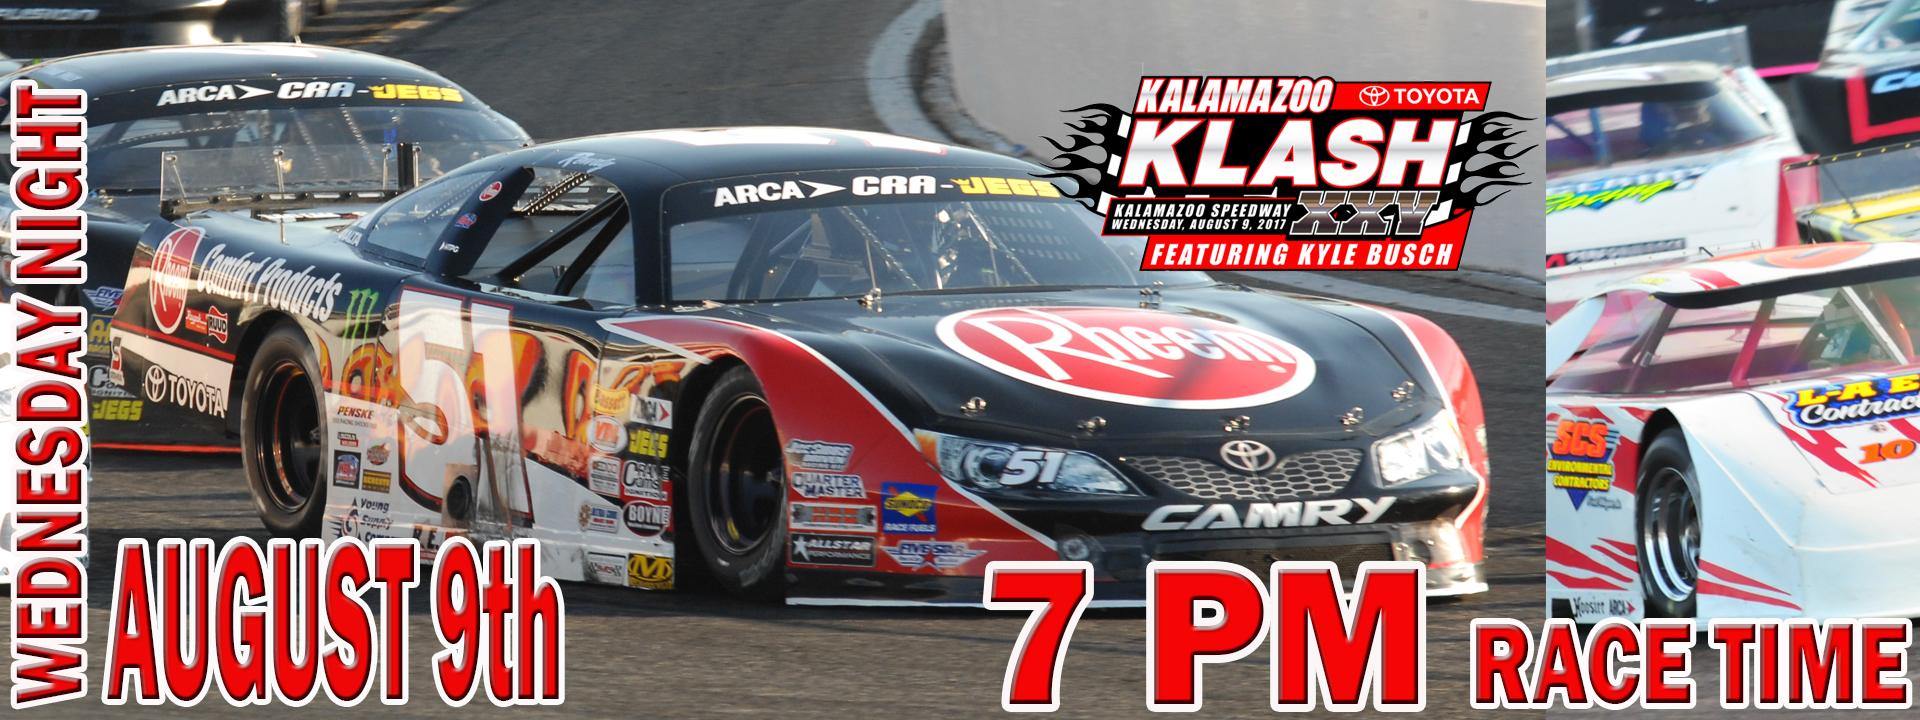 Kalamazoo Klash  XXV Presented by West Michigan Toyota Dealers & ARCA/CRA Super Series